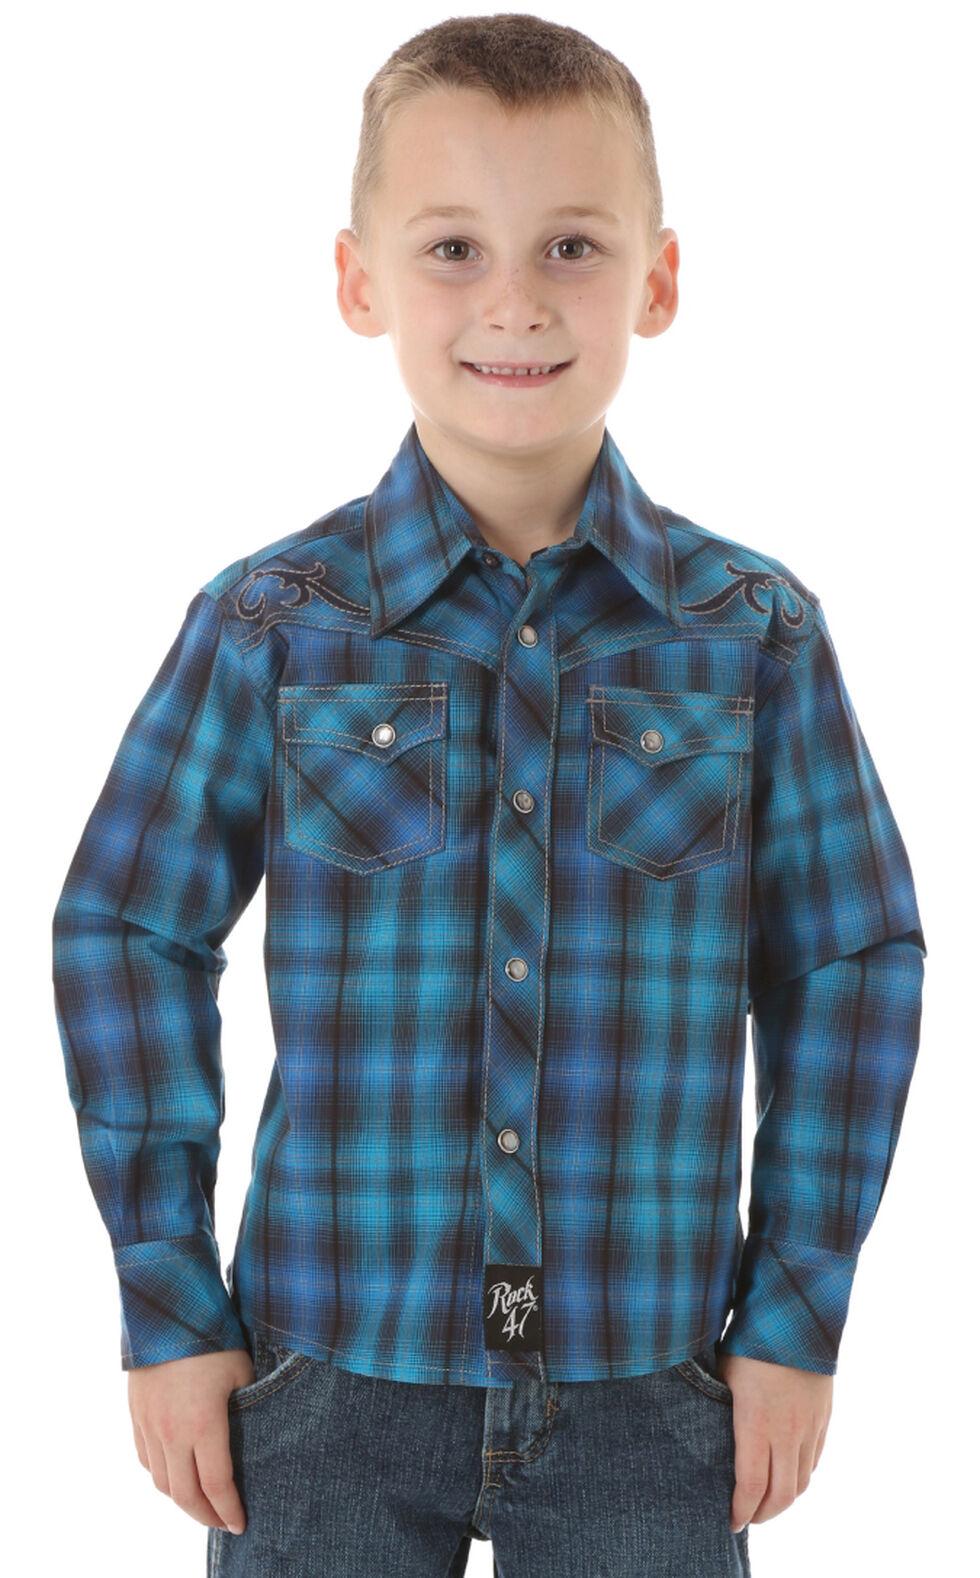 Wrangler Rock 47 Boys' Blue & Black Plaid Snap Shirt, Blue, hi-res